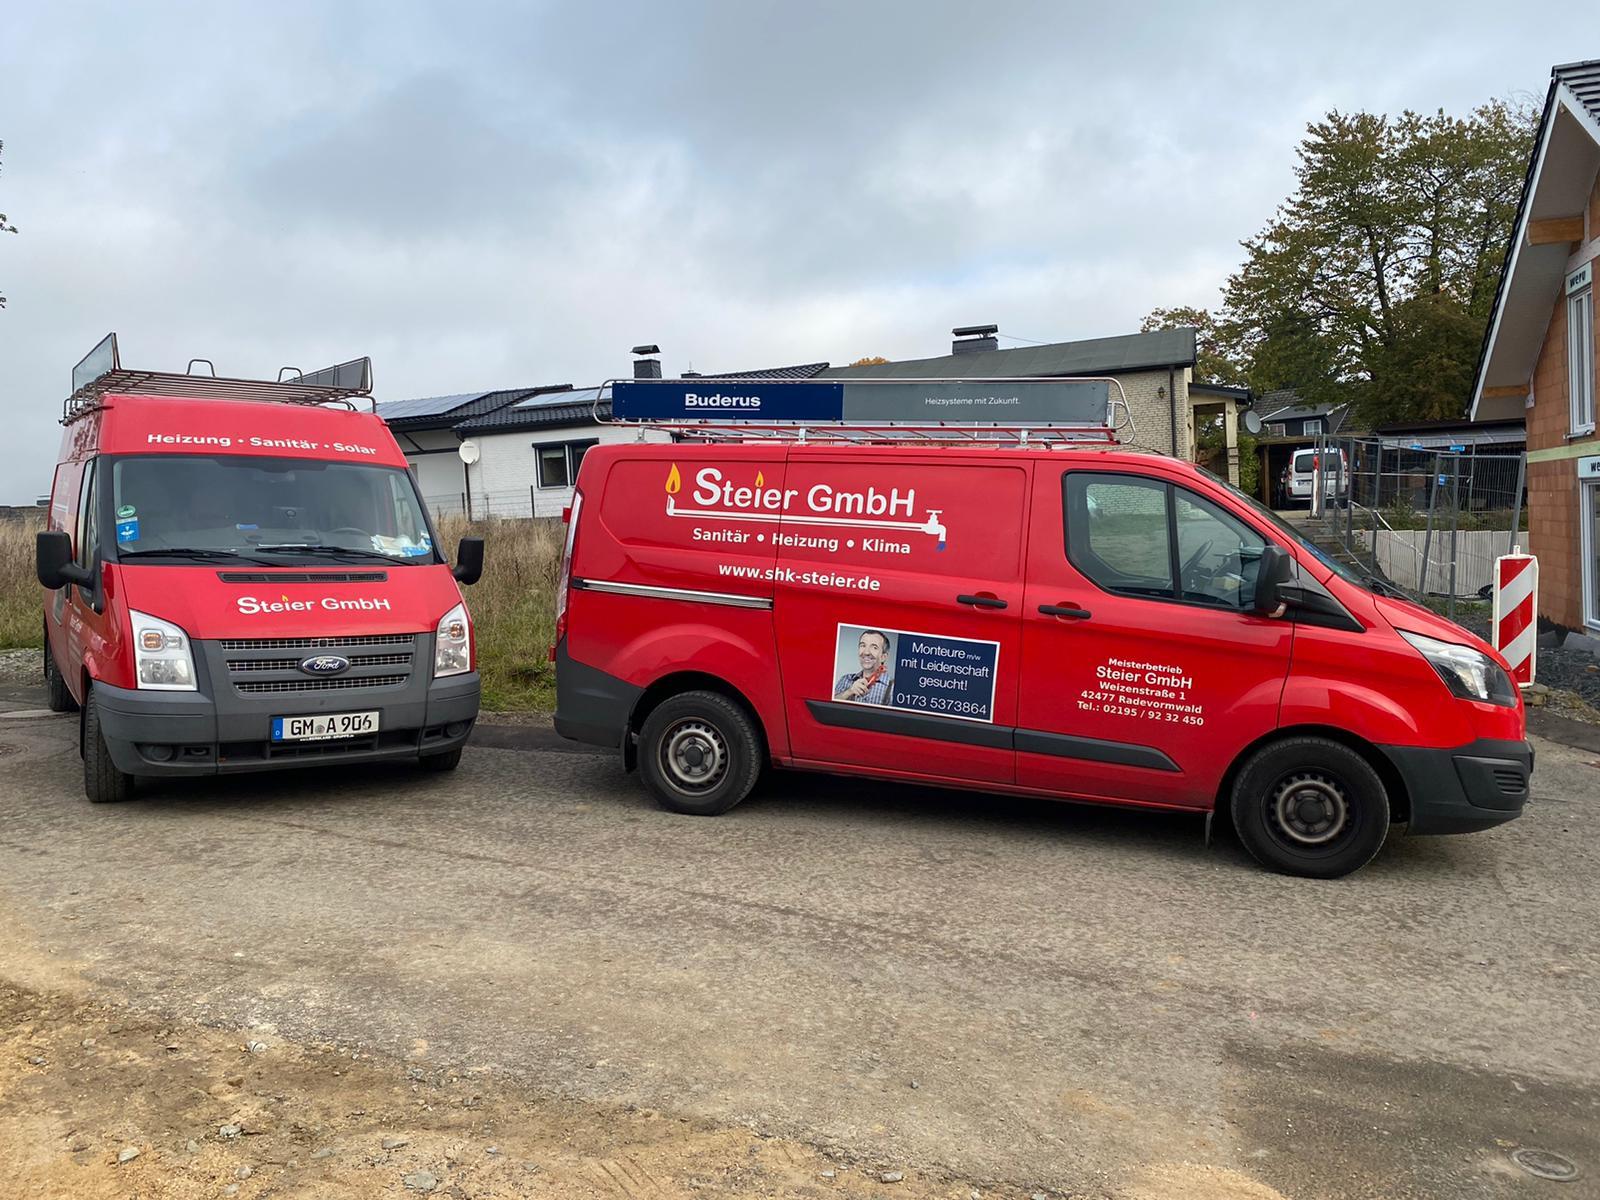 Steier GmbH Fahrzeuge